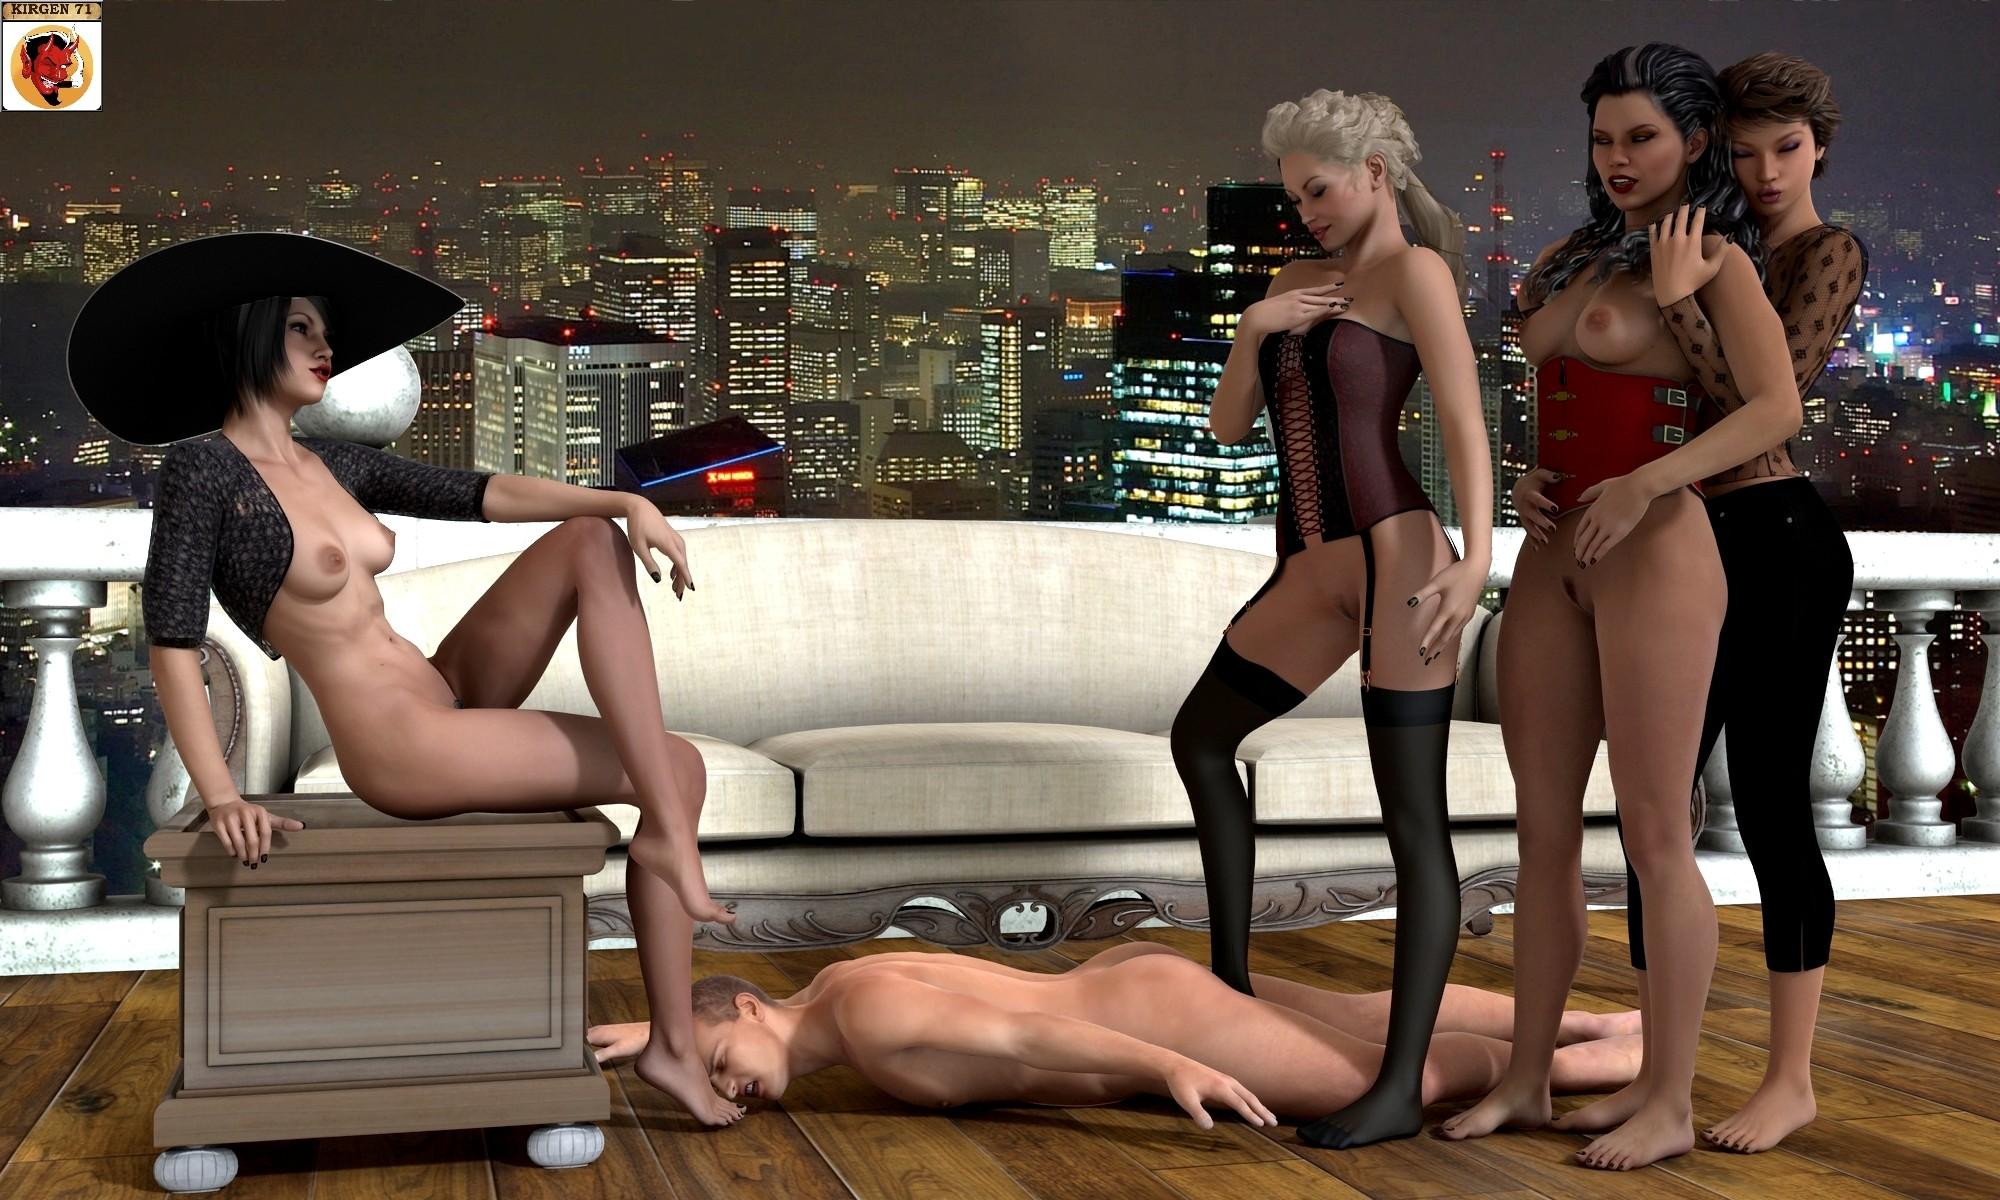 femdom-digital-art-4-15